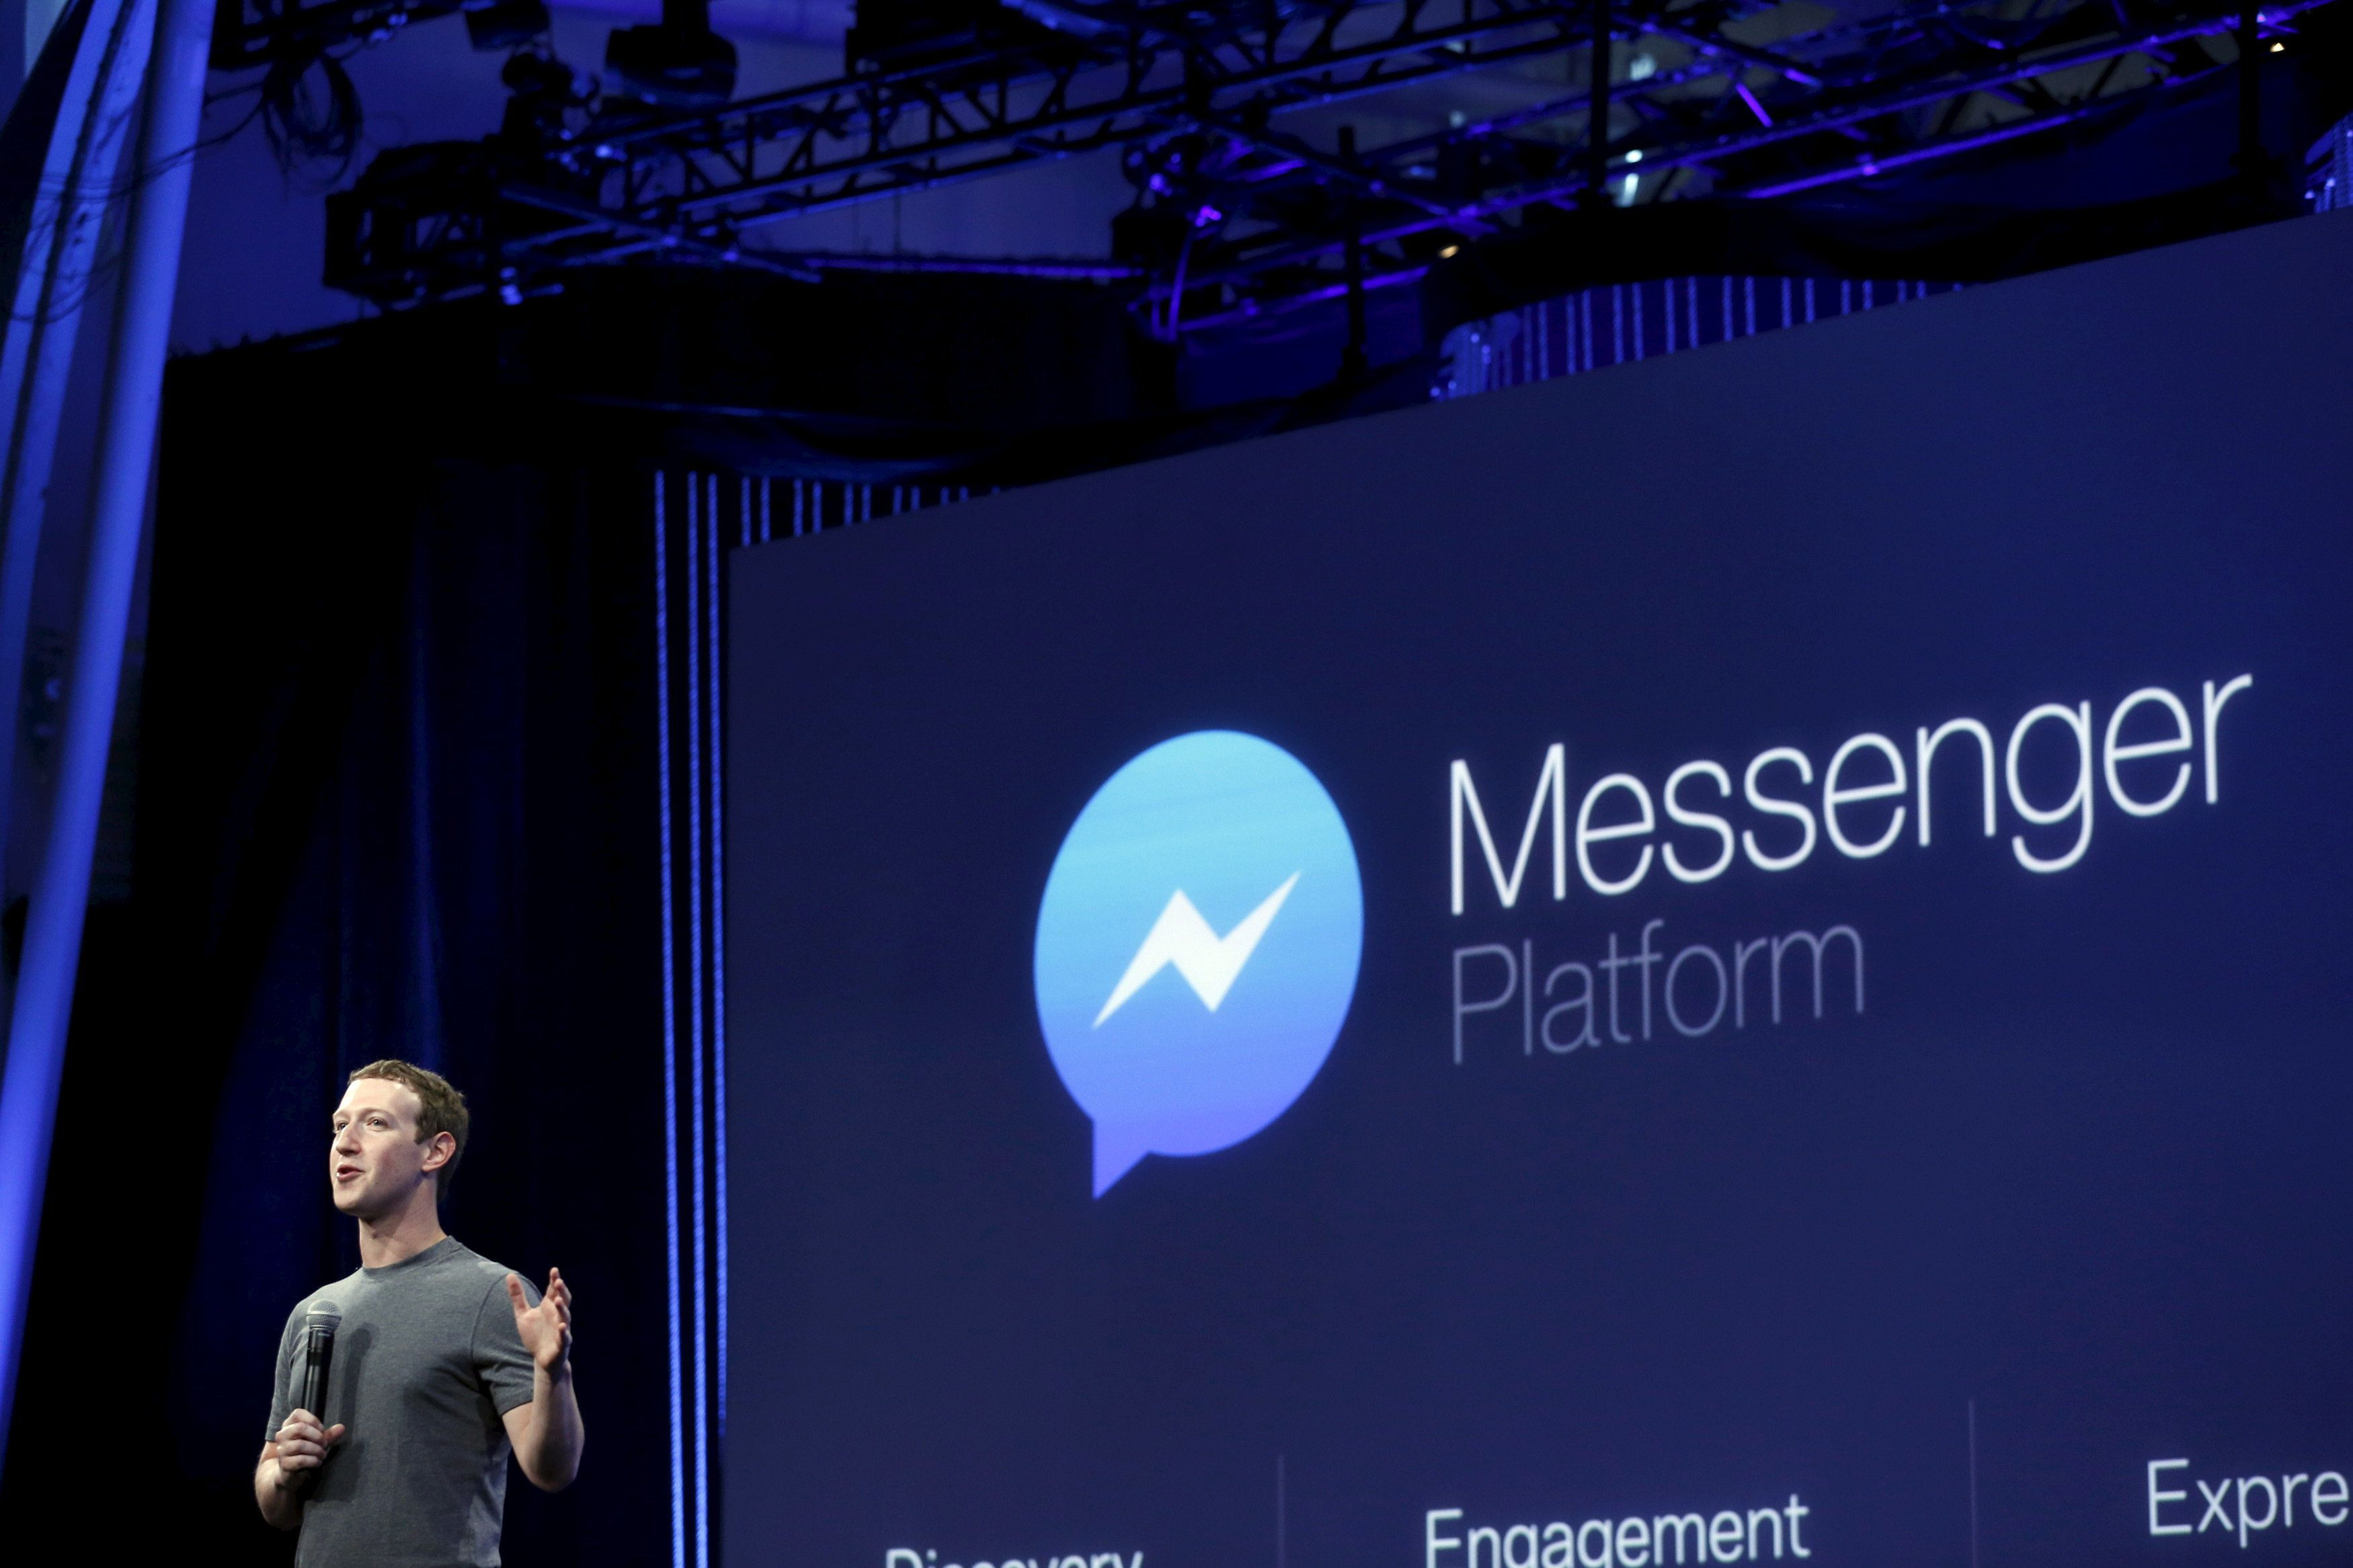 Facebook CEO Mark Zuckerberg speaks during his keynote address at Facebook F8 in San